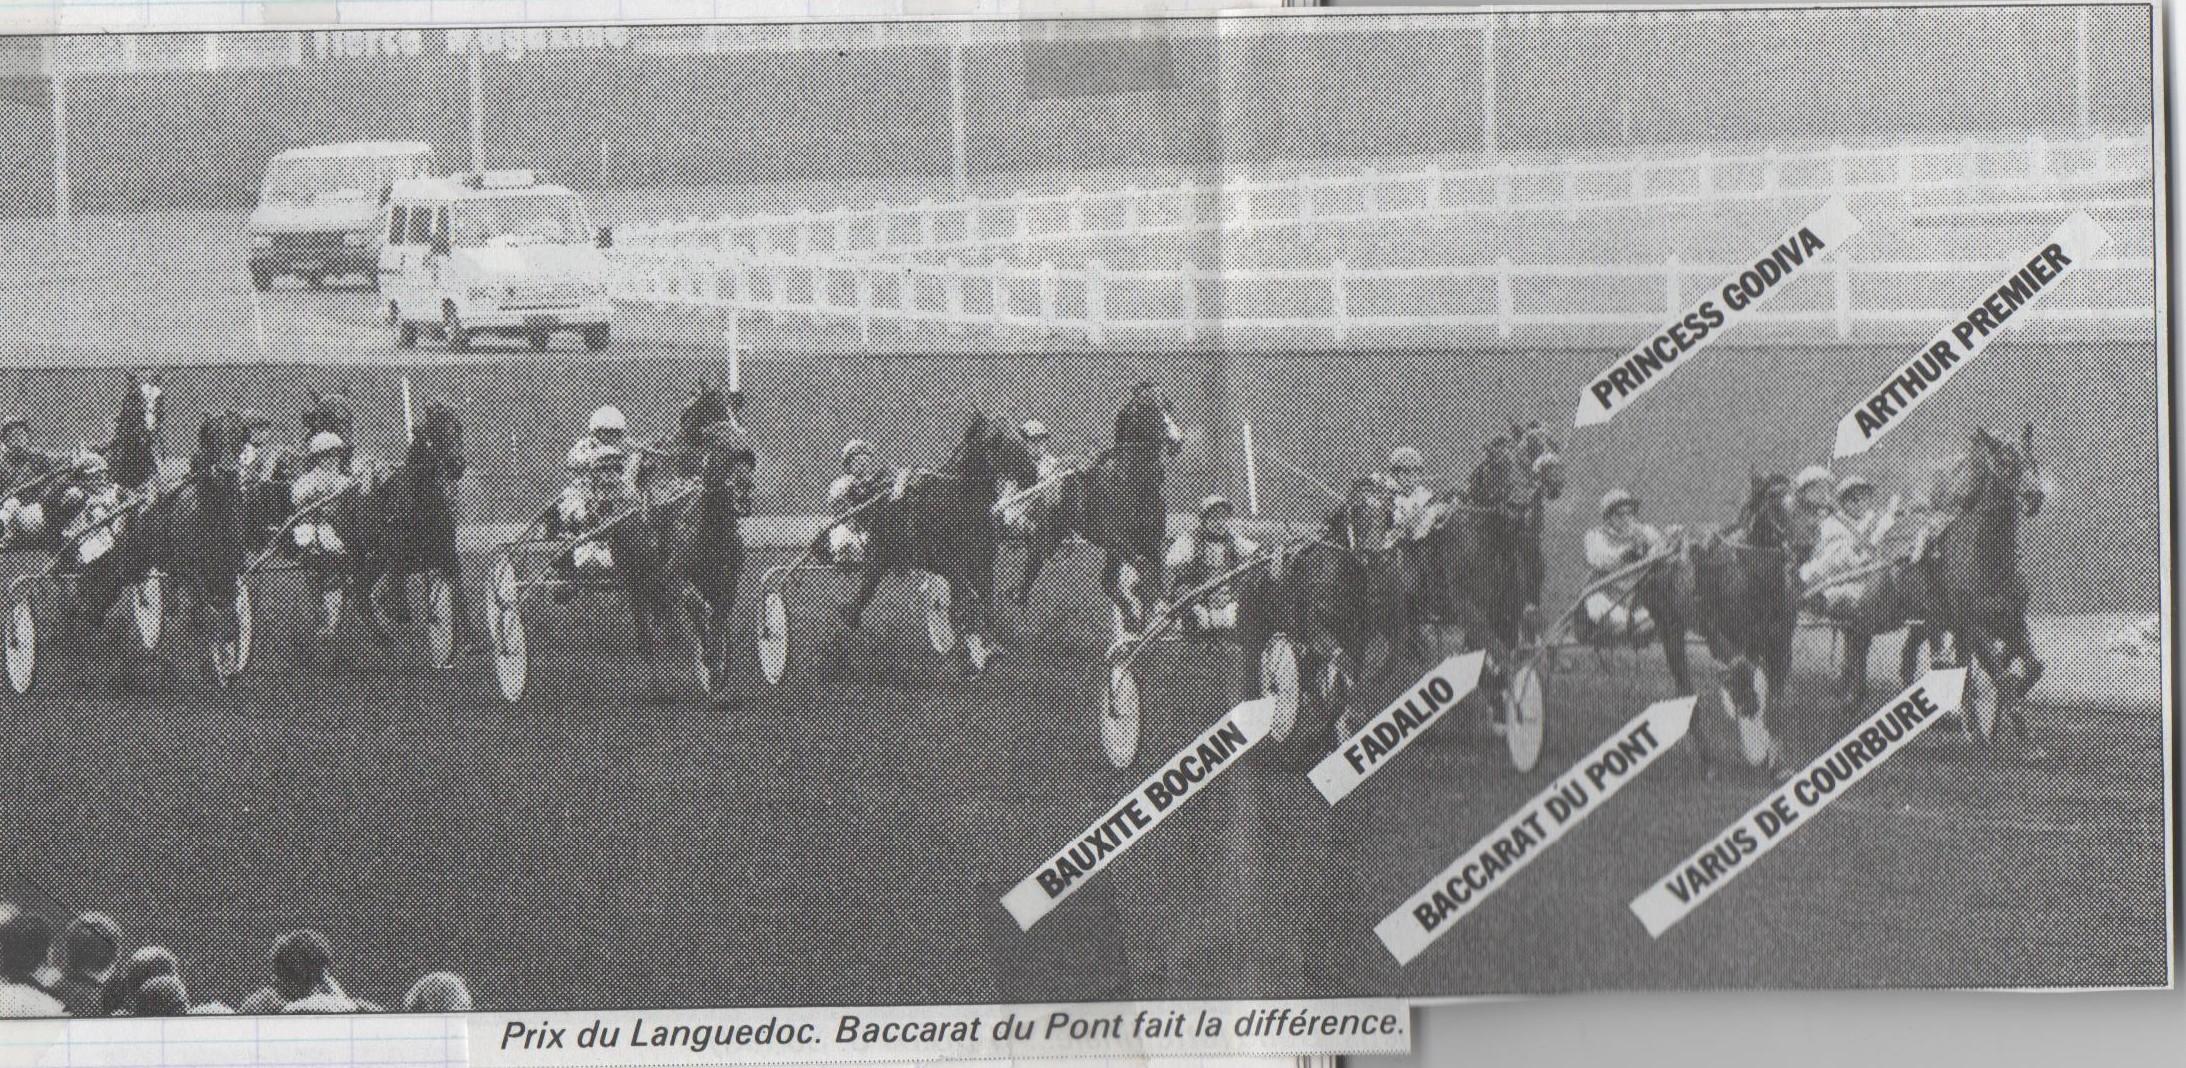 1995 11 23 Baccarat du Pont Prix du Languedoc